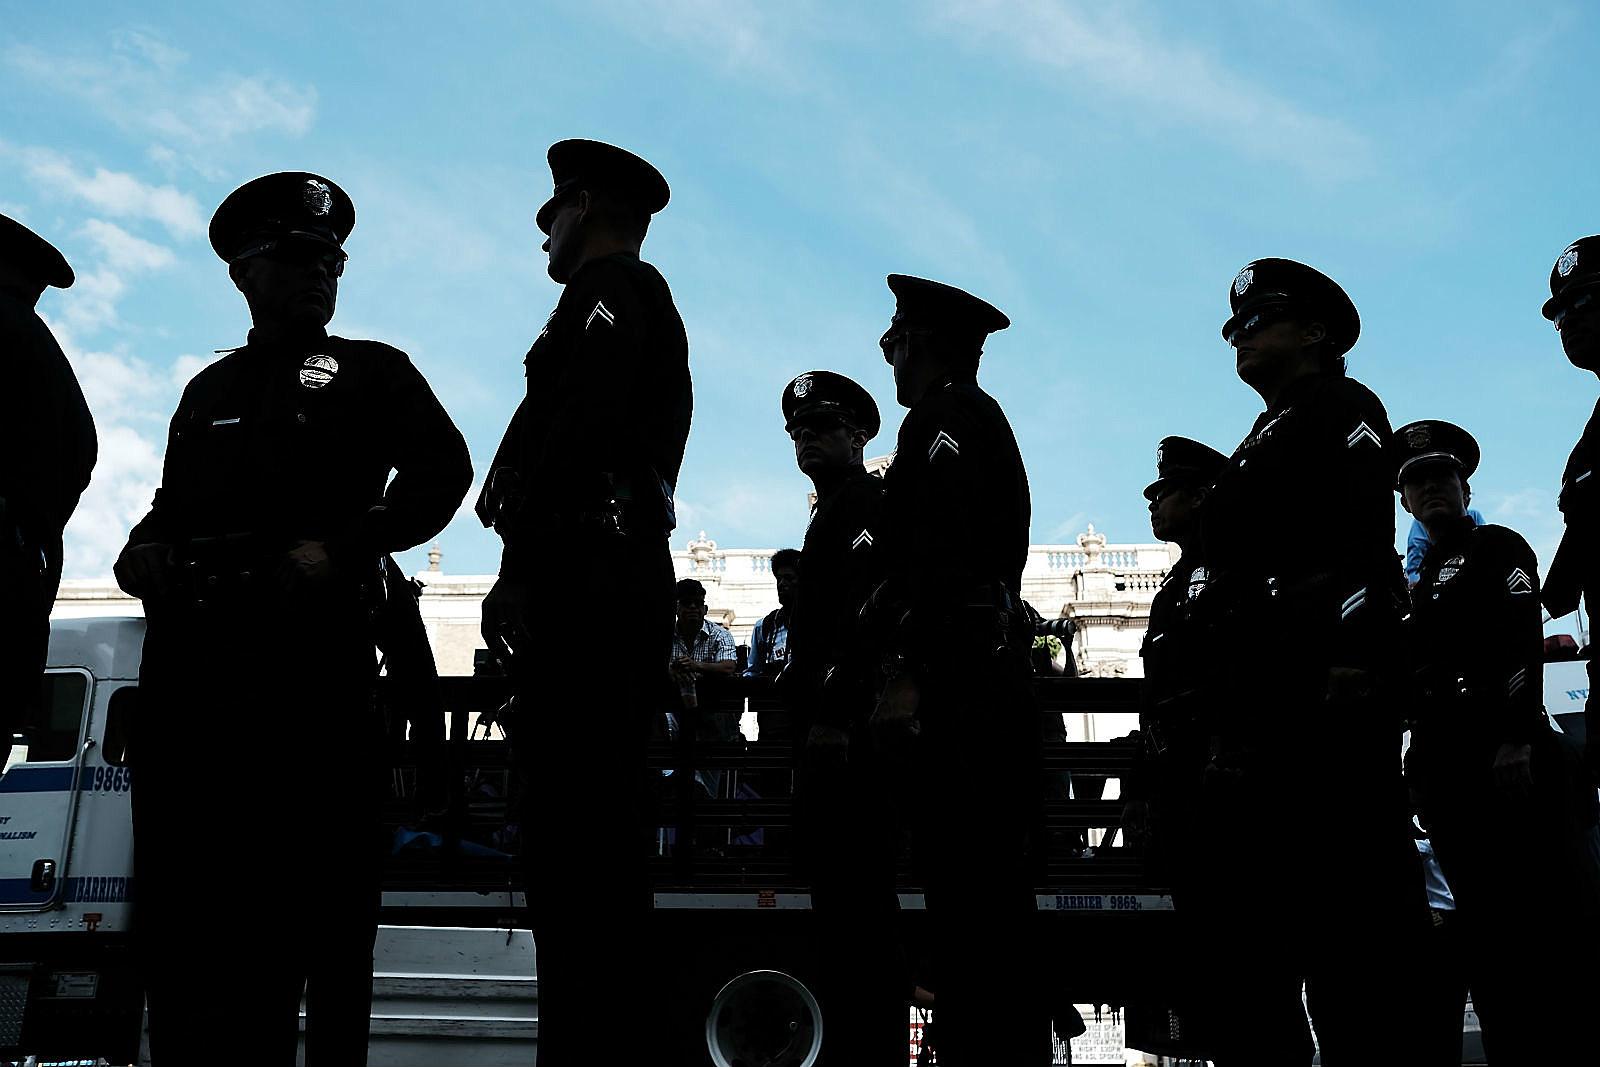 Police Funeral_Spencer Platt/Getty